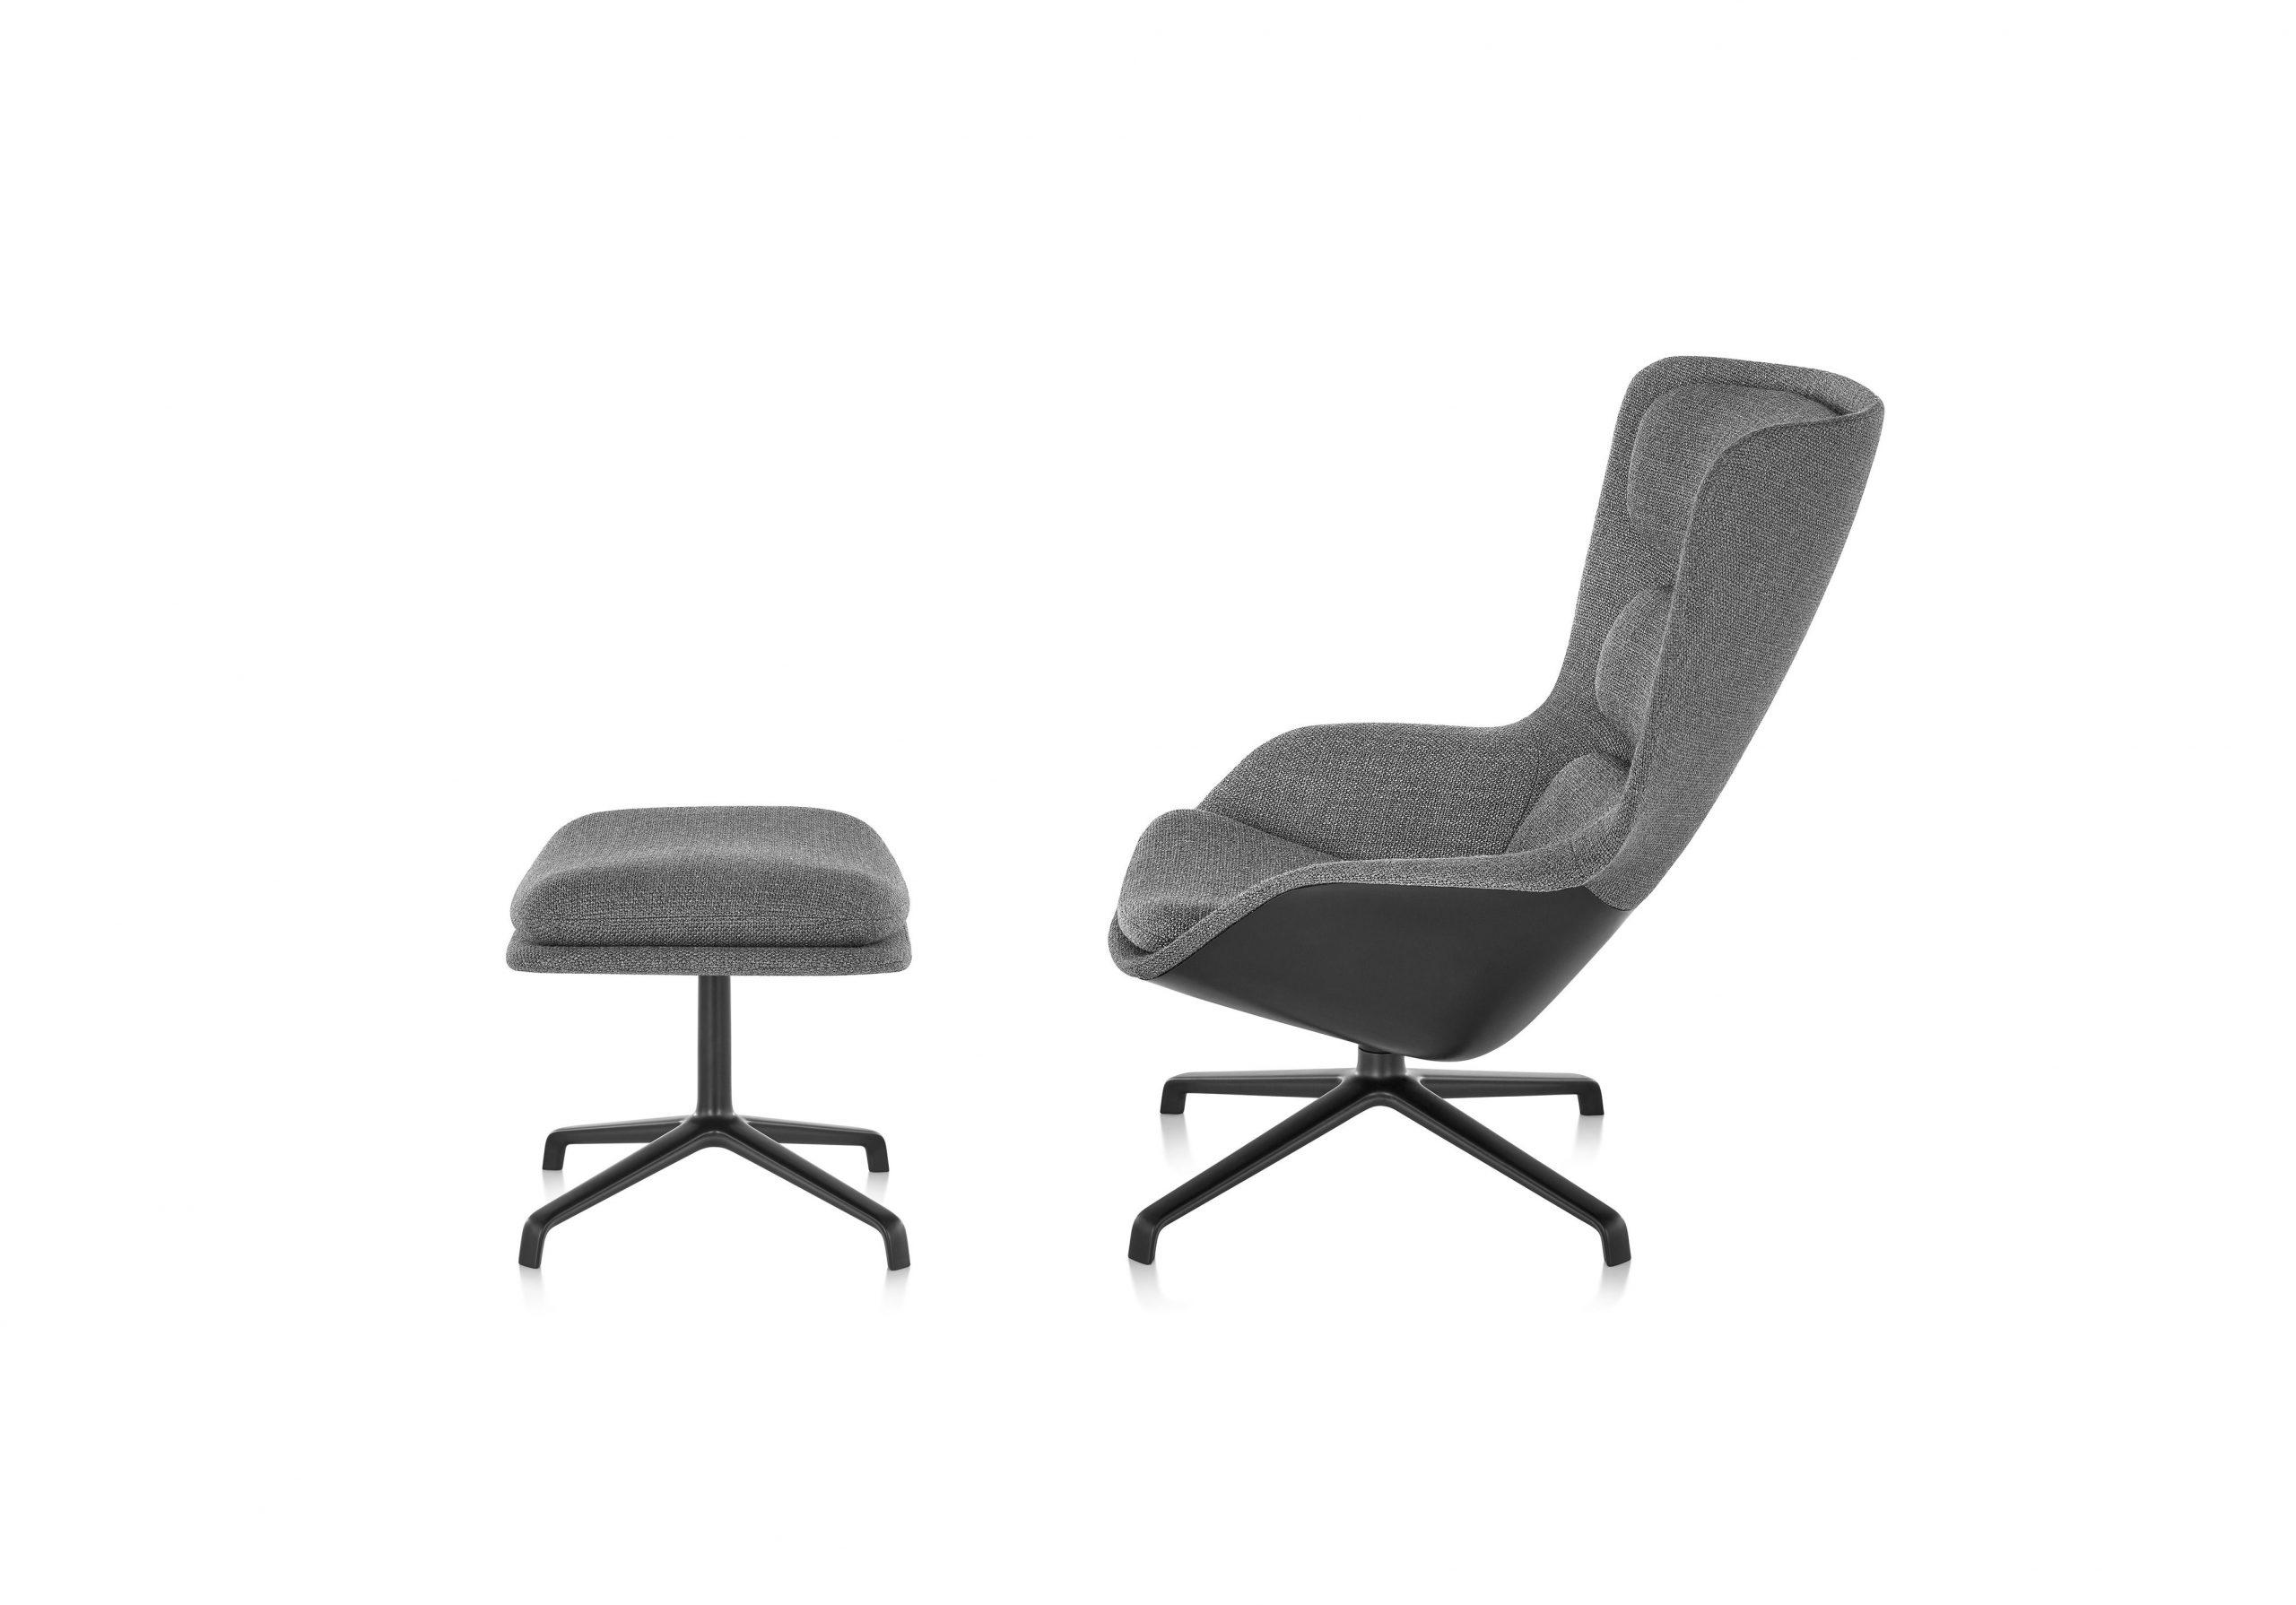 Park Art|My WordPress Blog_Striad Lounge Chair And Ottoman Price